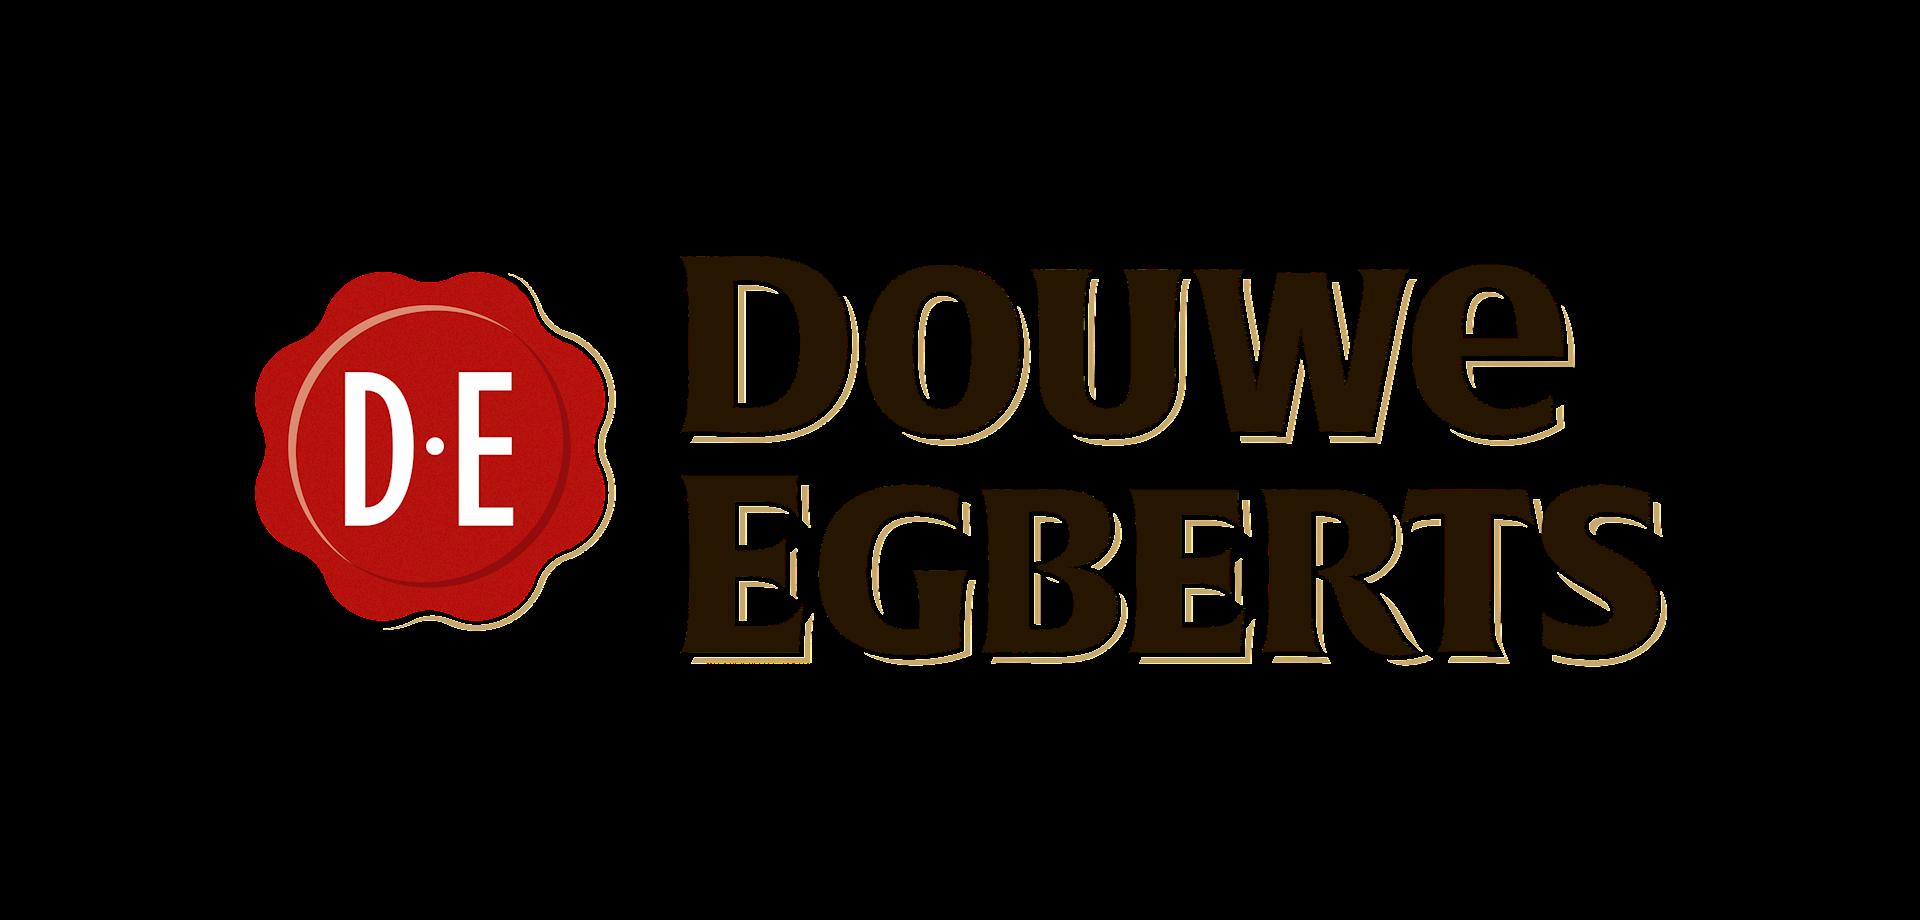 Merkafbeelding DOUWE EGBERTS AROMA ROOD